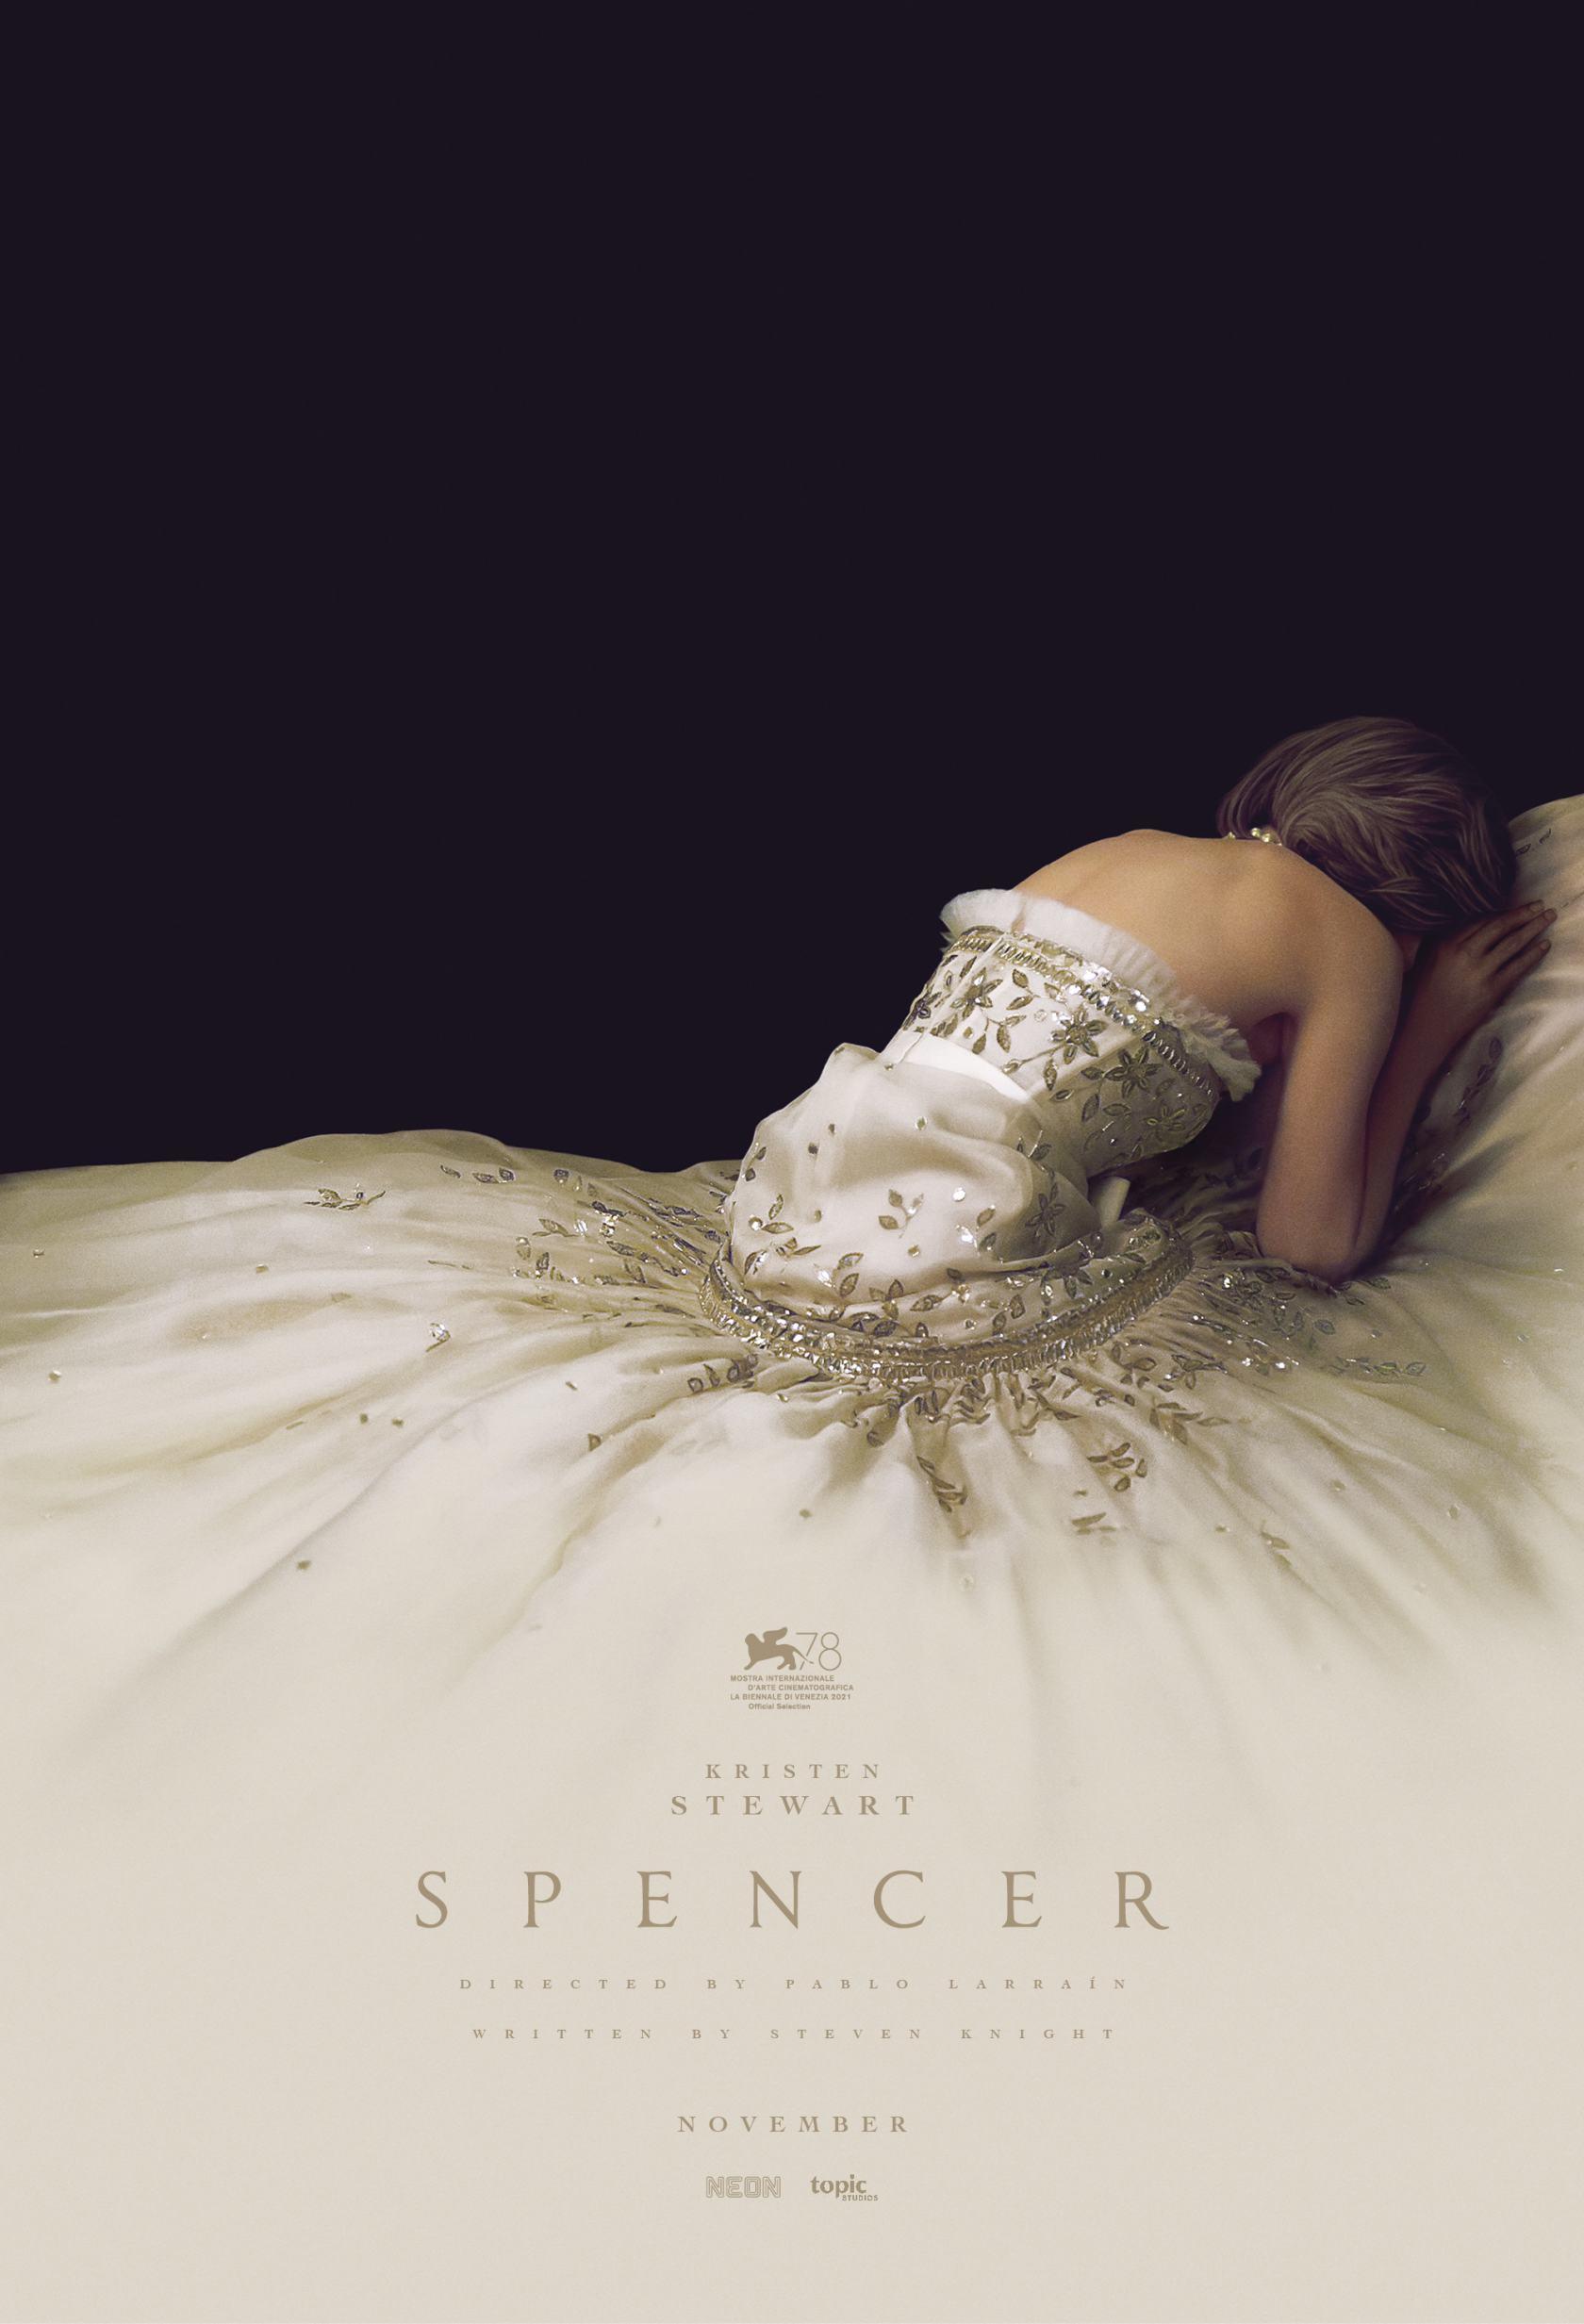 Spencer Poster #1